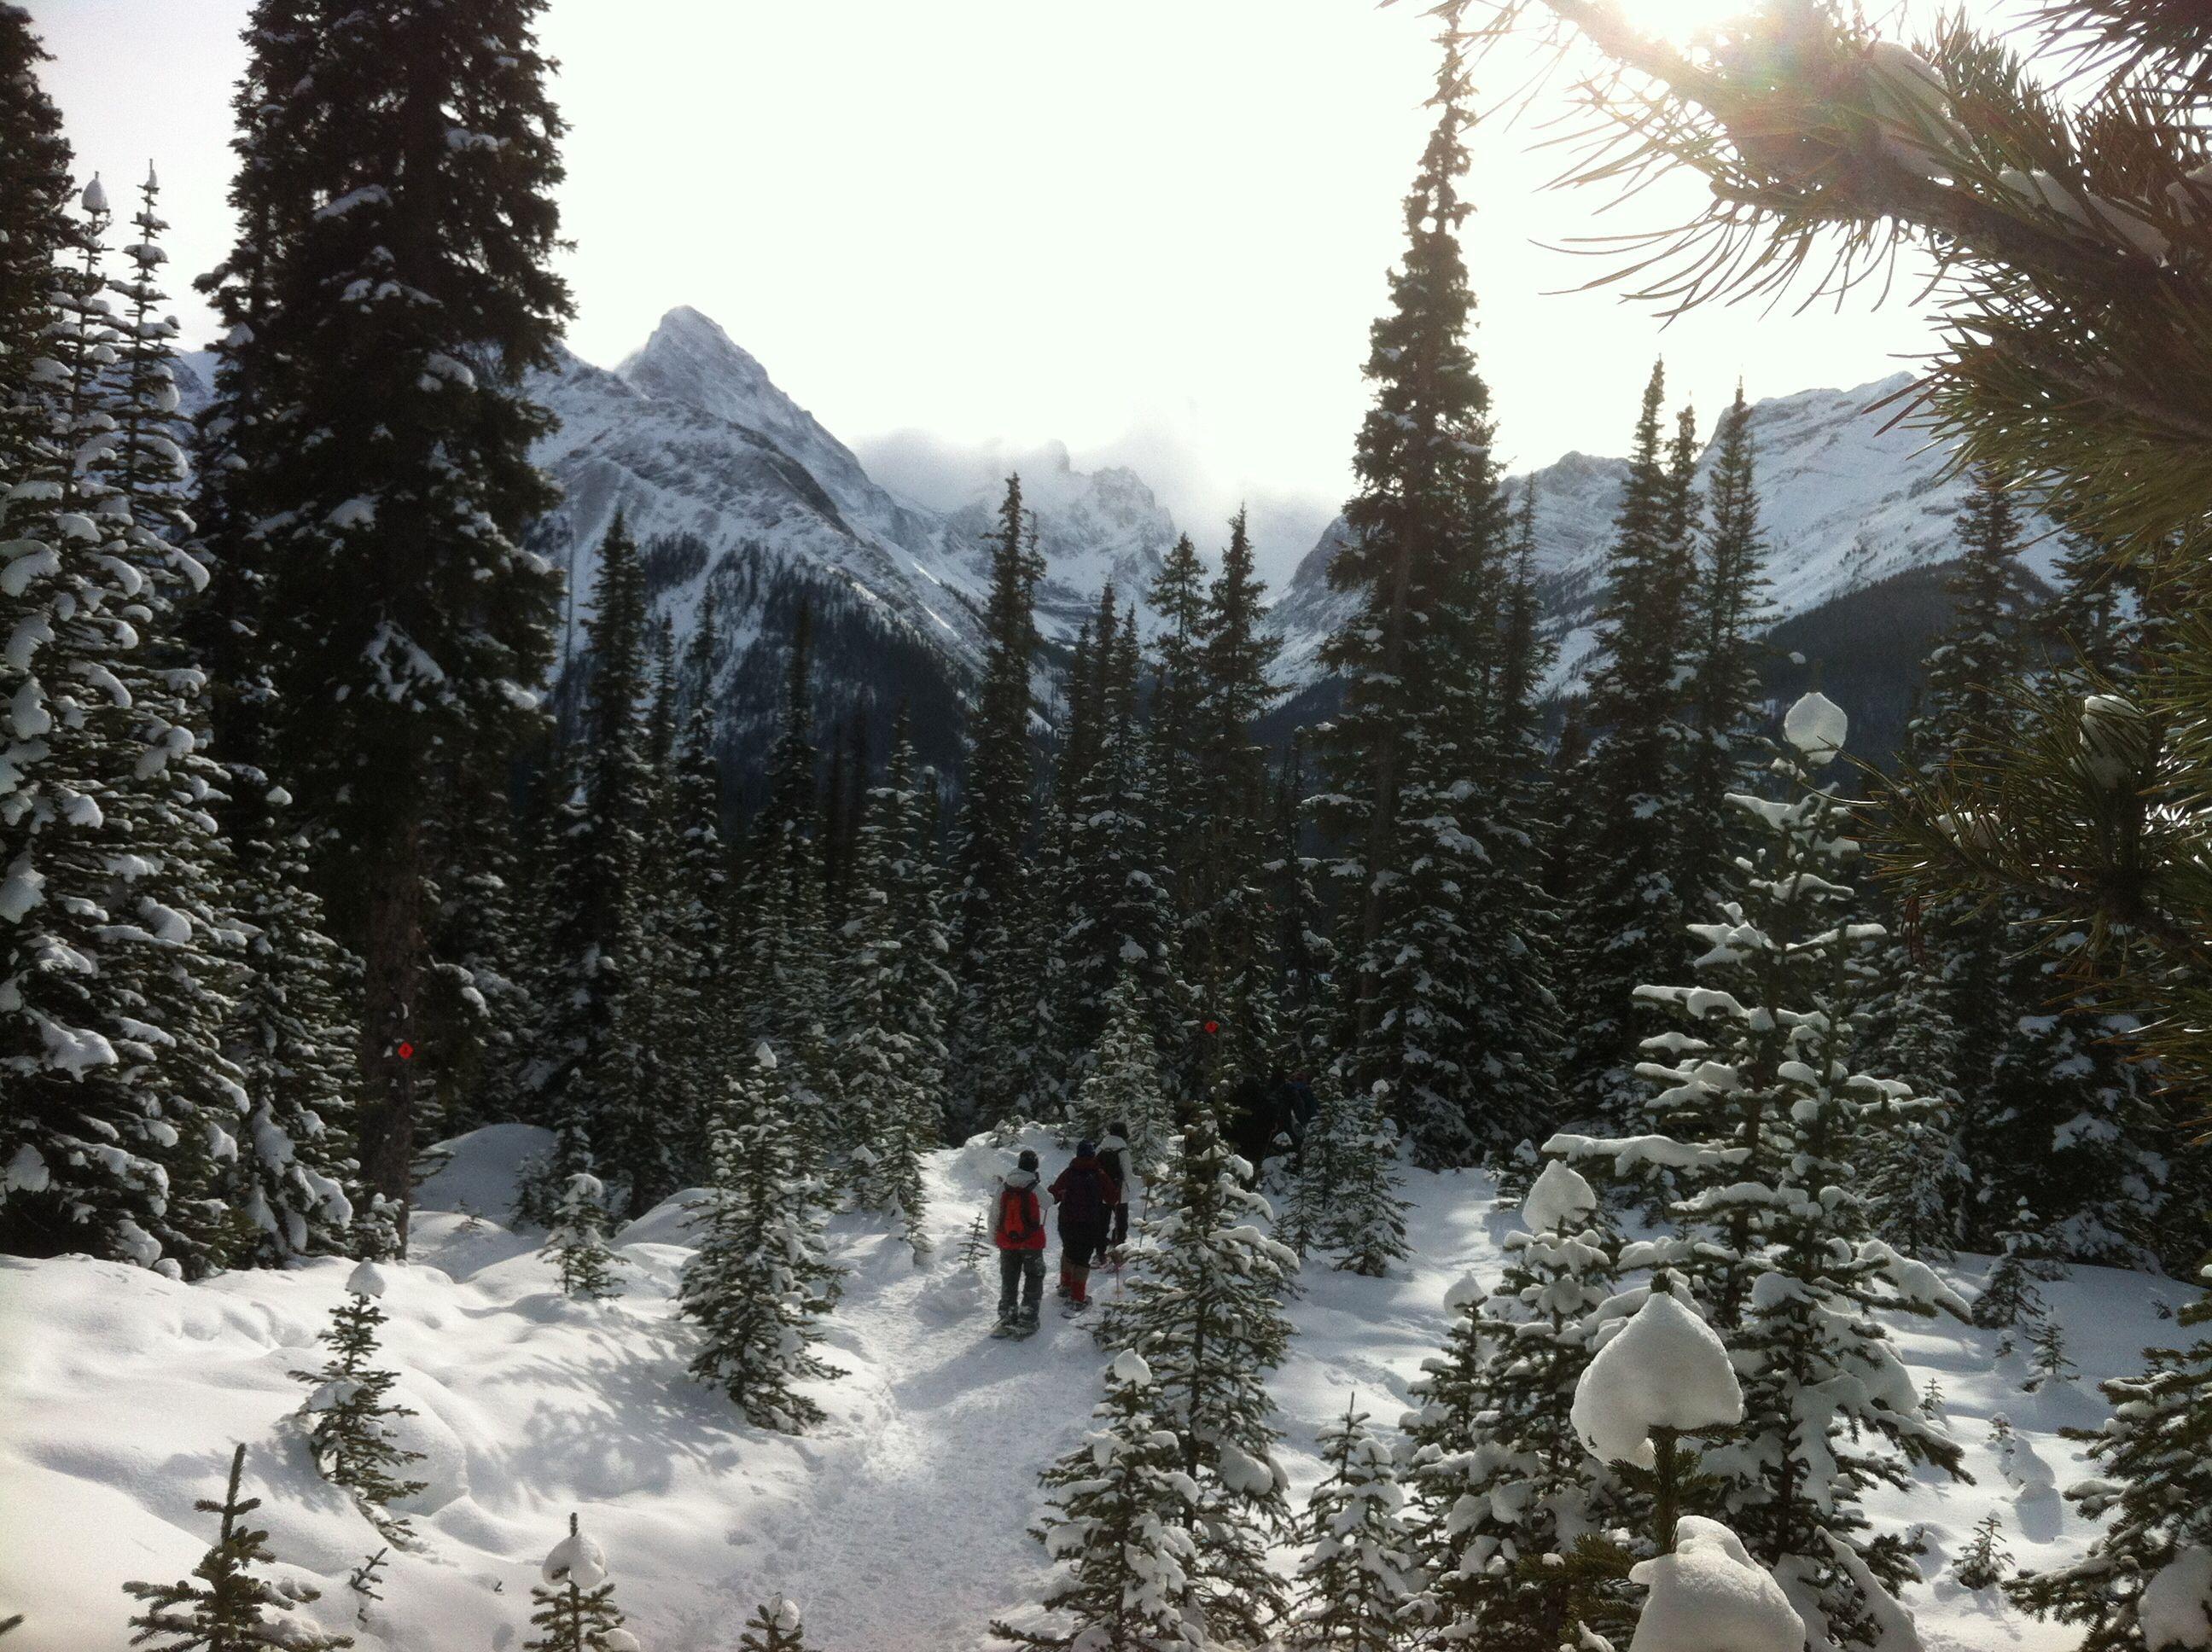 Snowshoeing at Chester Lake/ Kananaskis Country